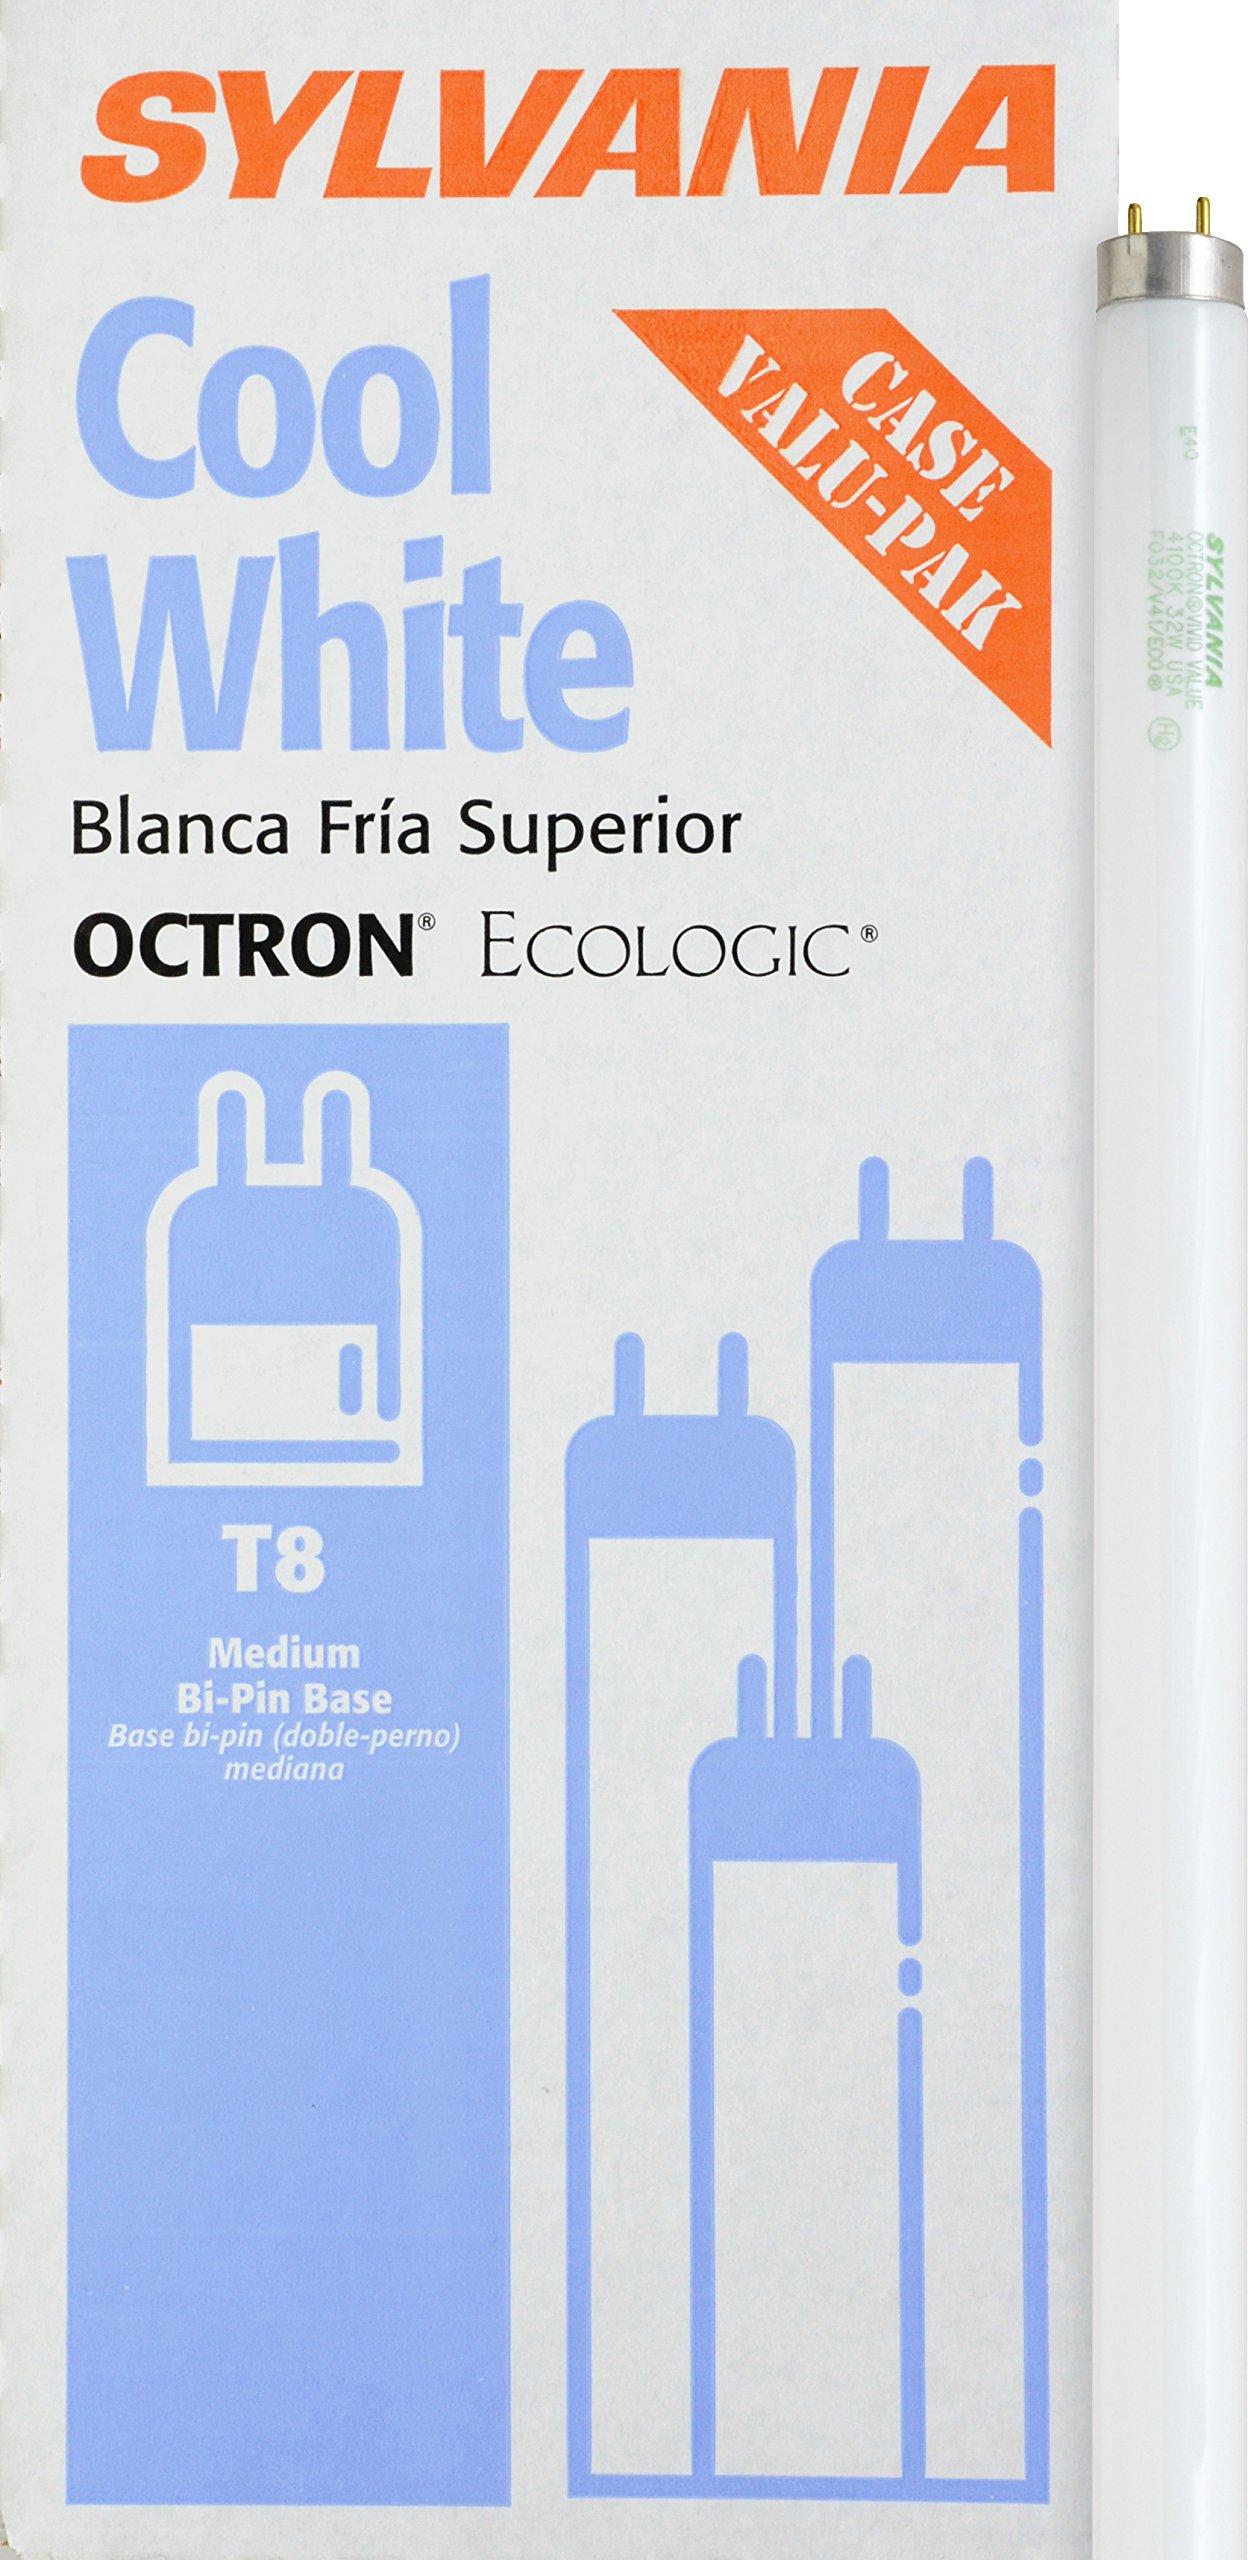 Sylvania 22433 32-watt T8 Octron Fluorescent Ecologic Lamp with Instant Start or Rapid Start, Cool White, 12-Pack